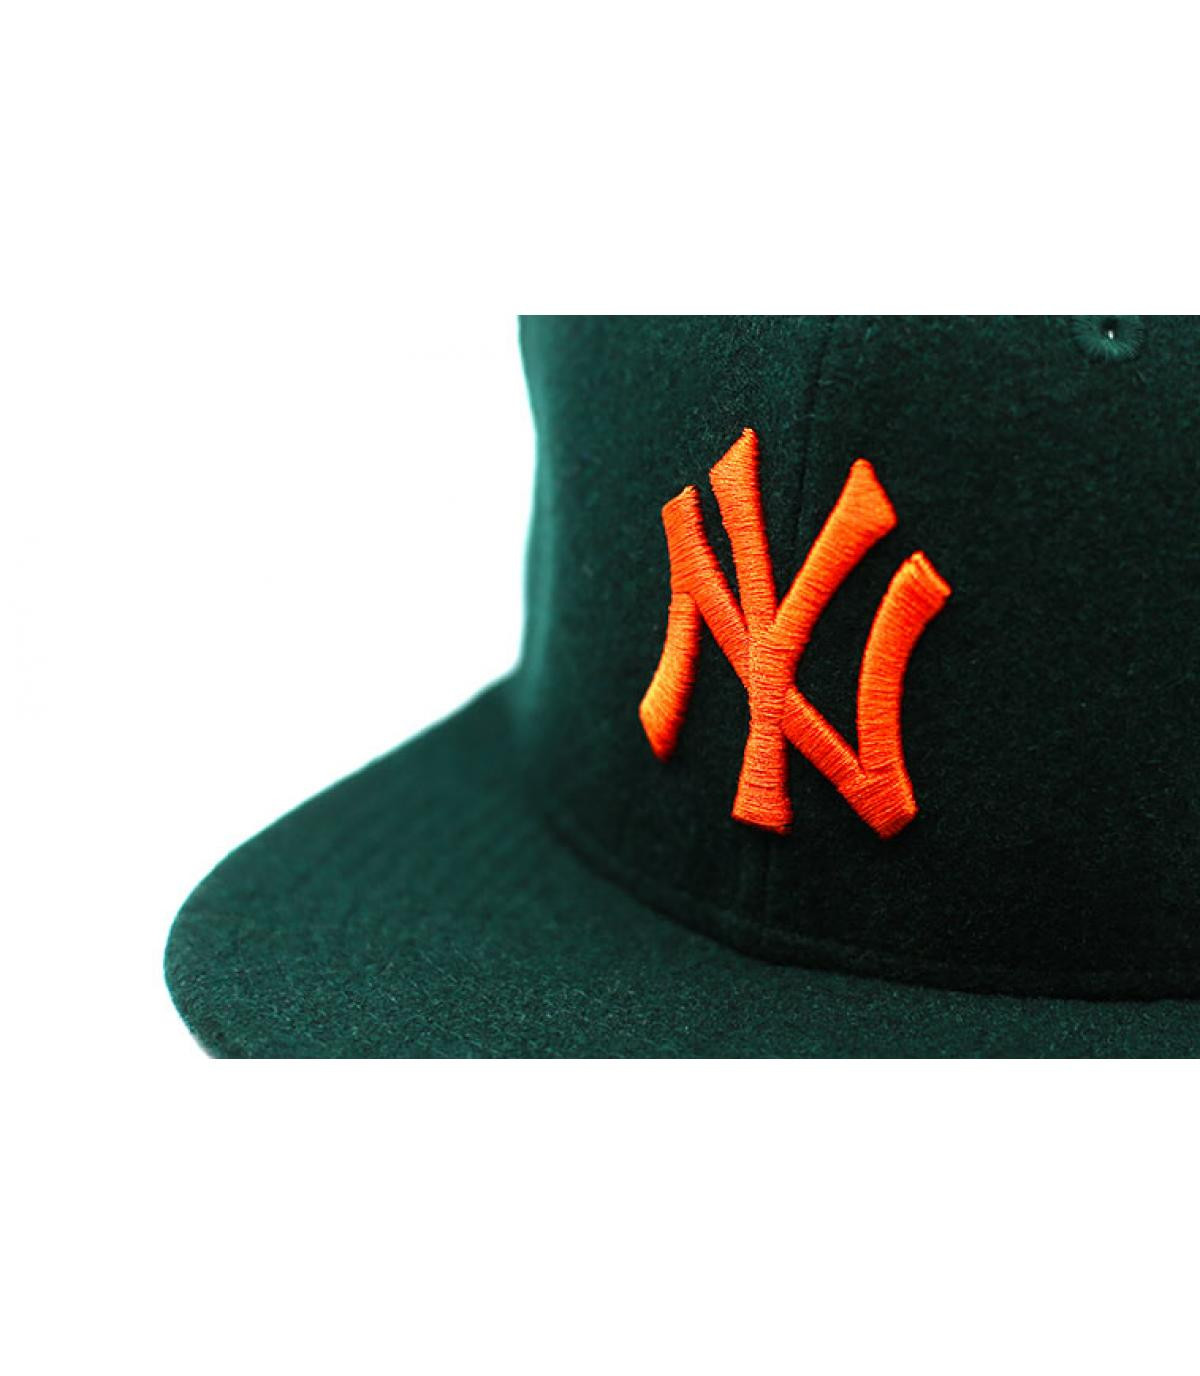 Dettagli Winter Utility NY Melton 9Fifty dark green orange - image 3